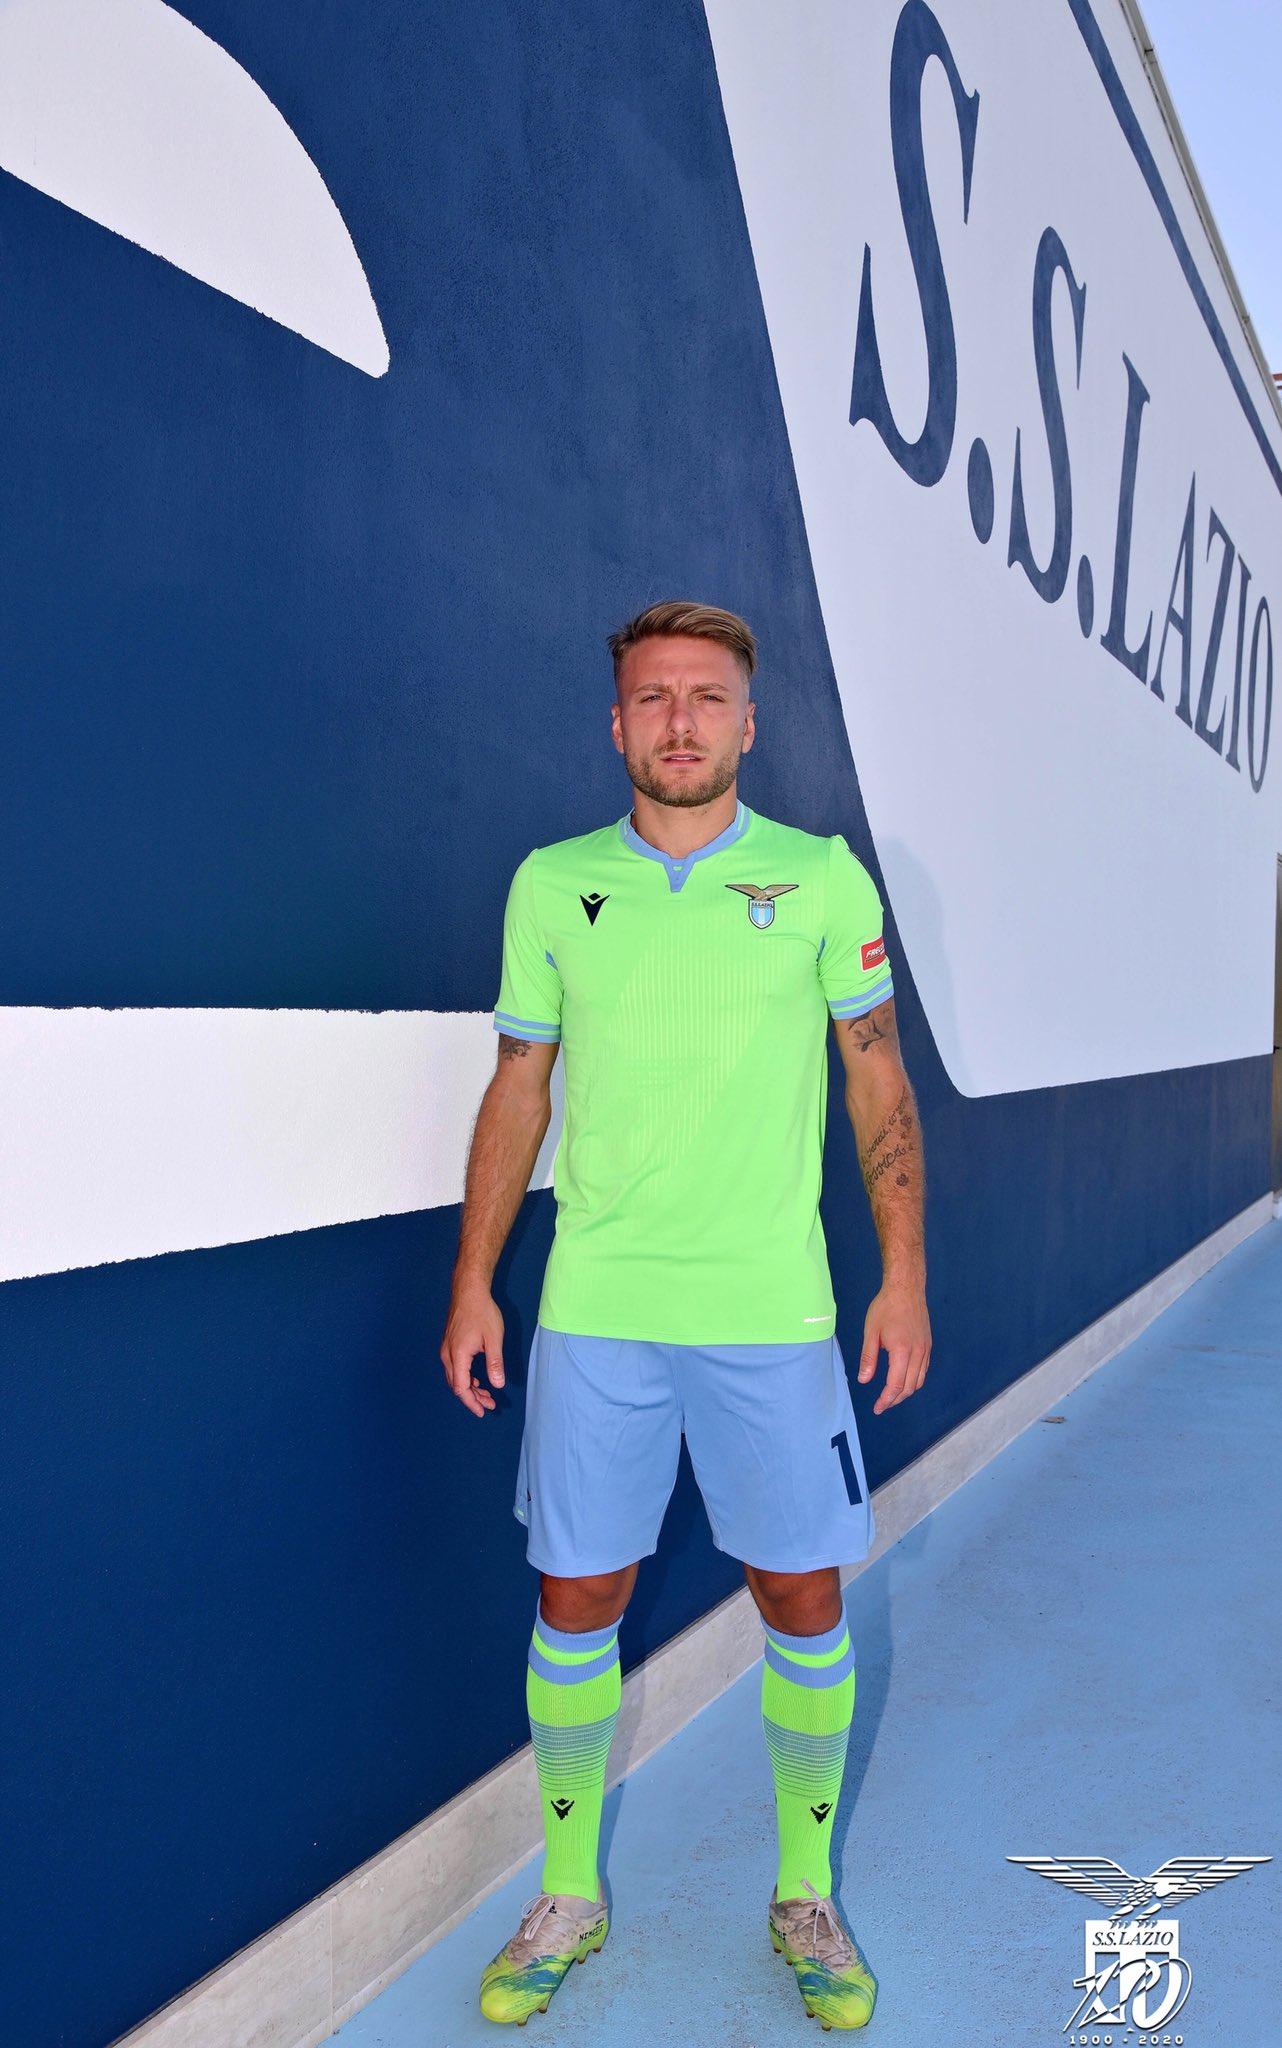 Camisa reserva da SS Lazio 2020-2021 Macron